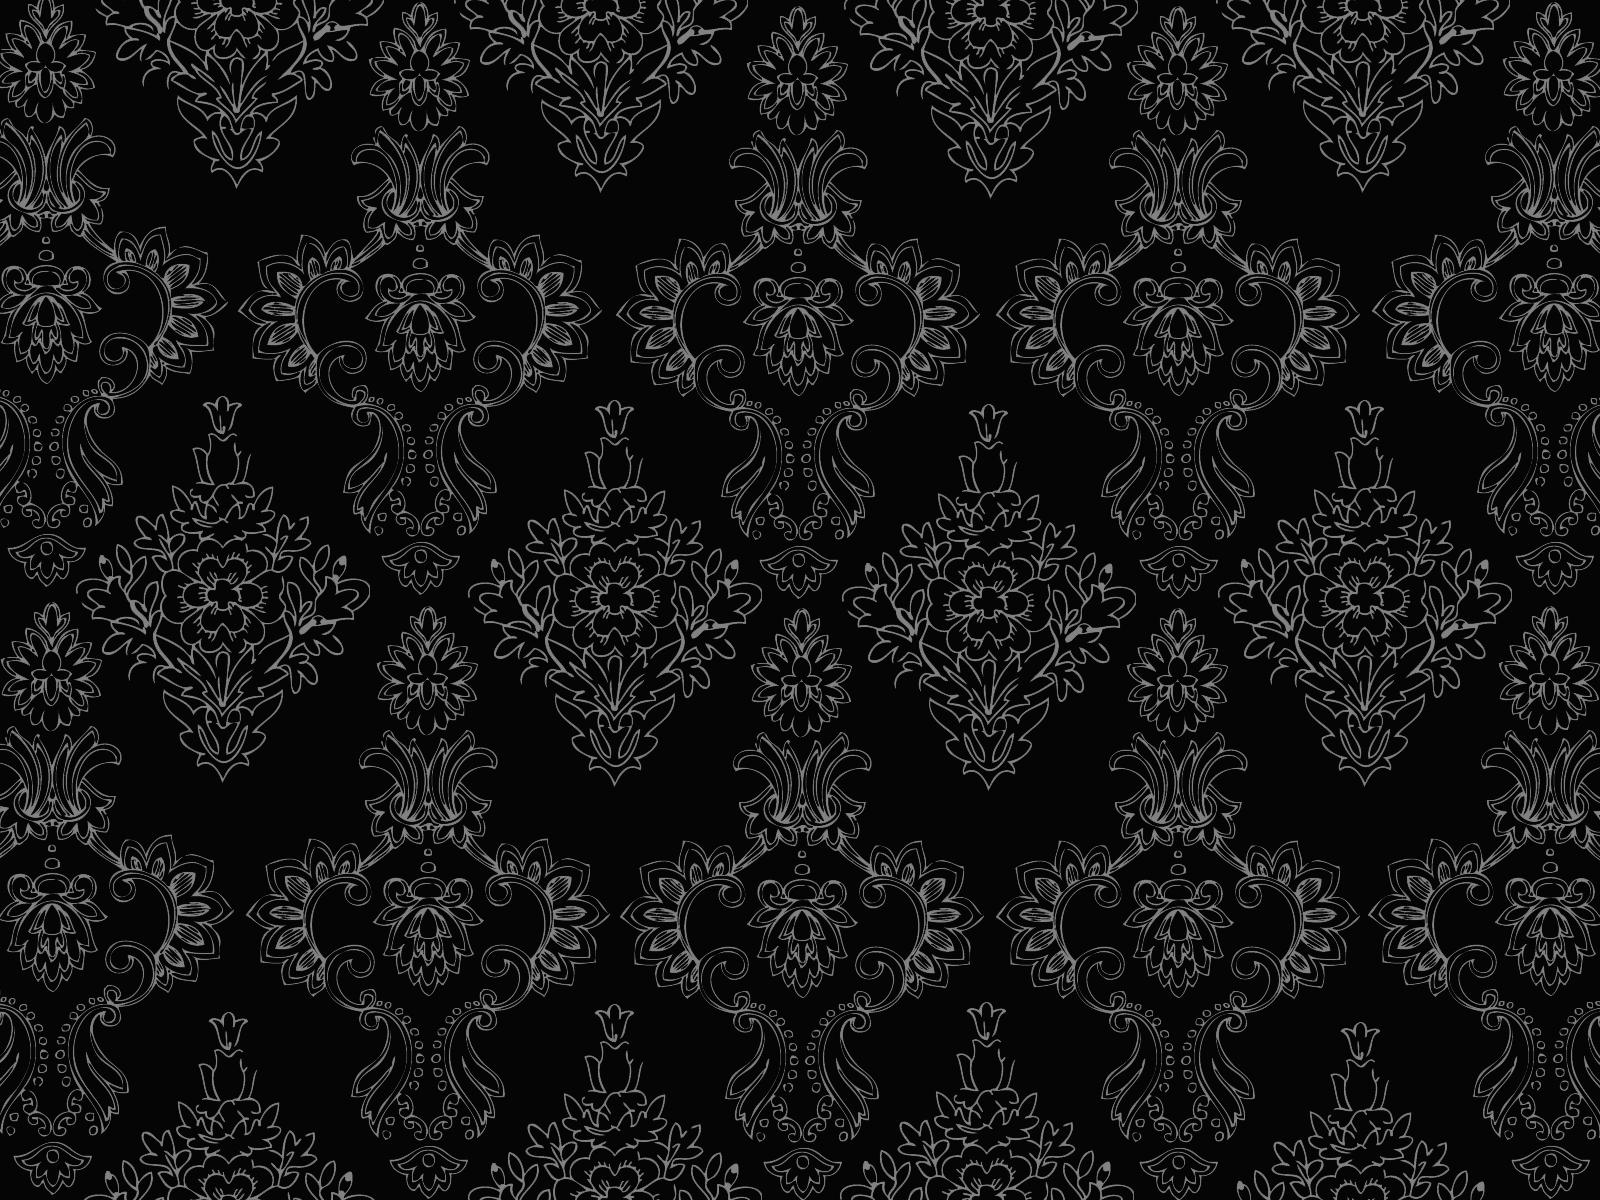 Black And White Wallpapers Tumblr Wallpapersafari